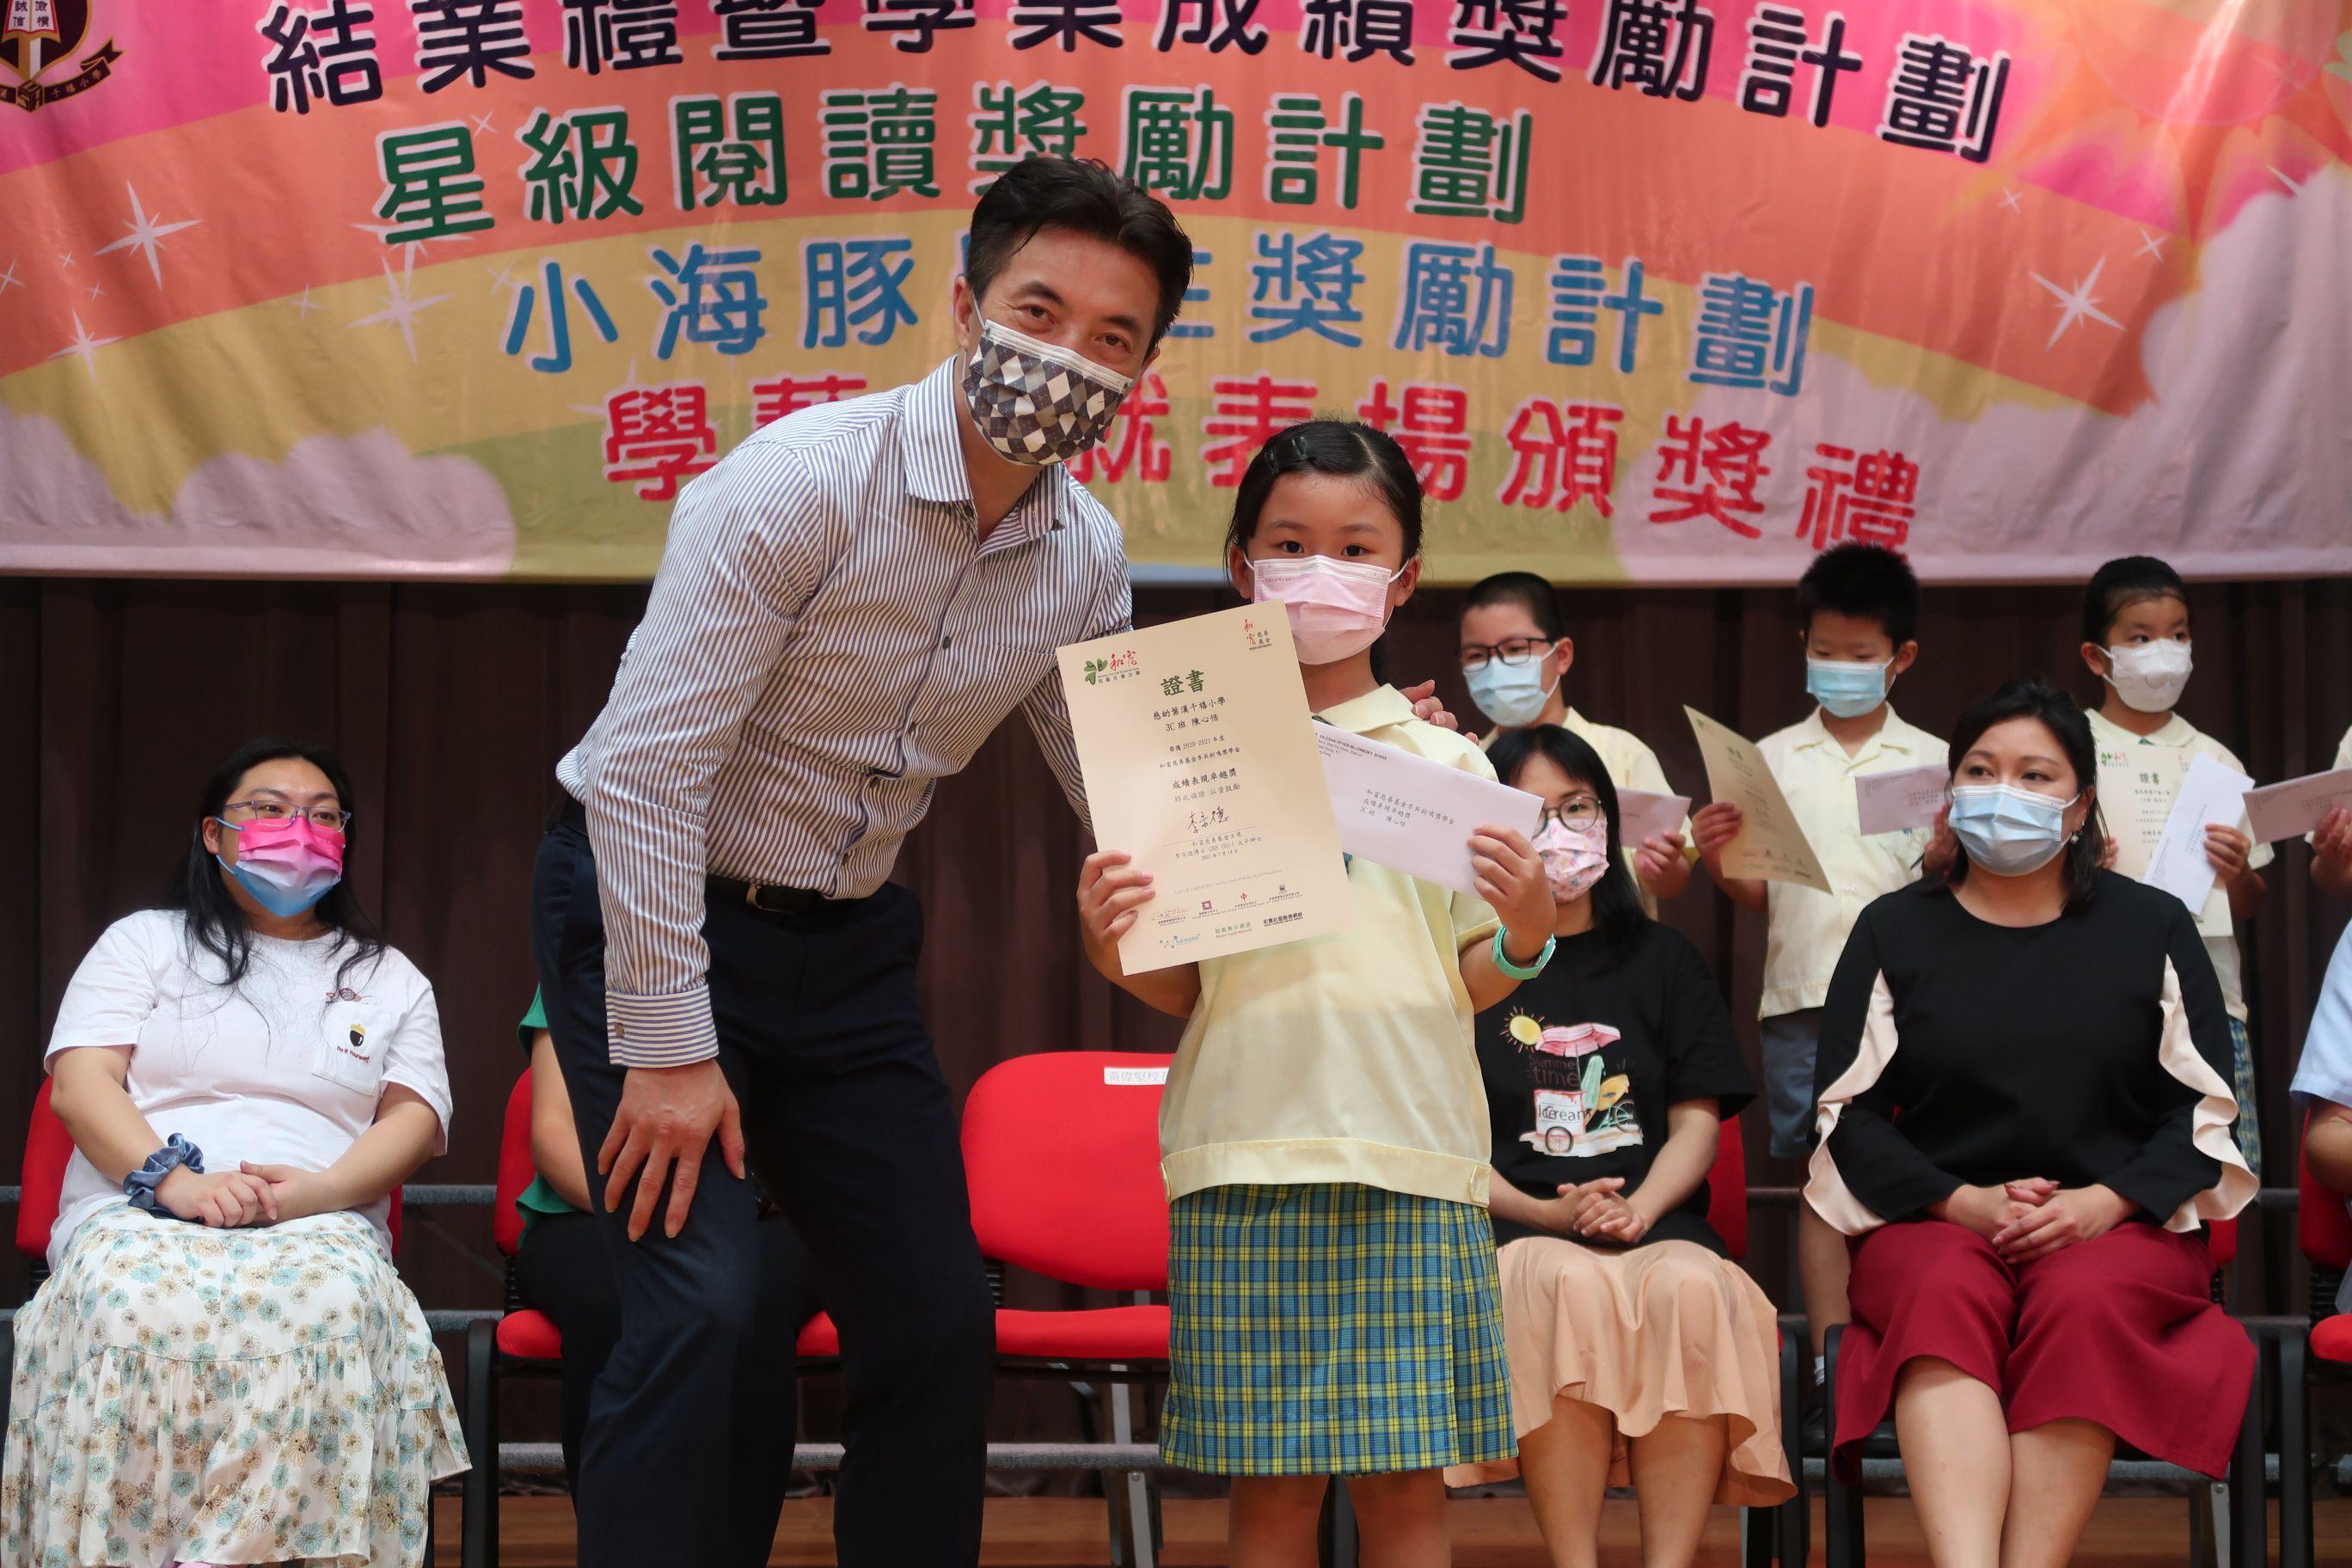 https://syh.edu.hk/sites/default/files/img_5933.jpg